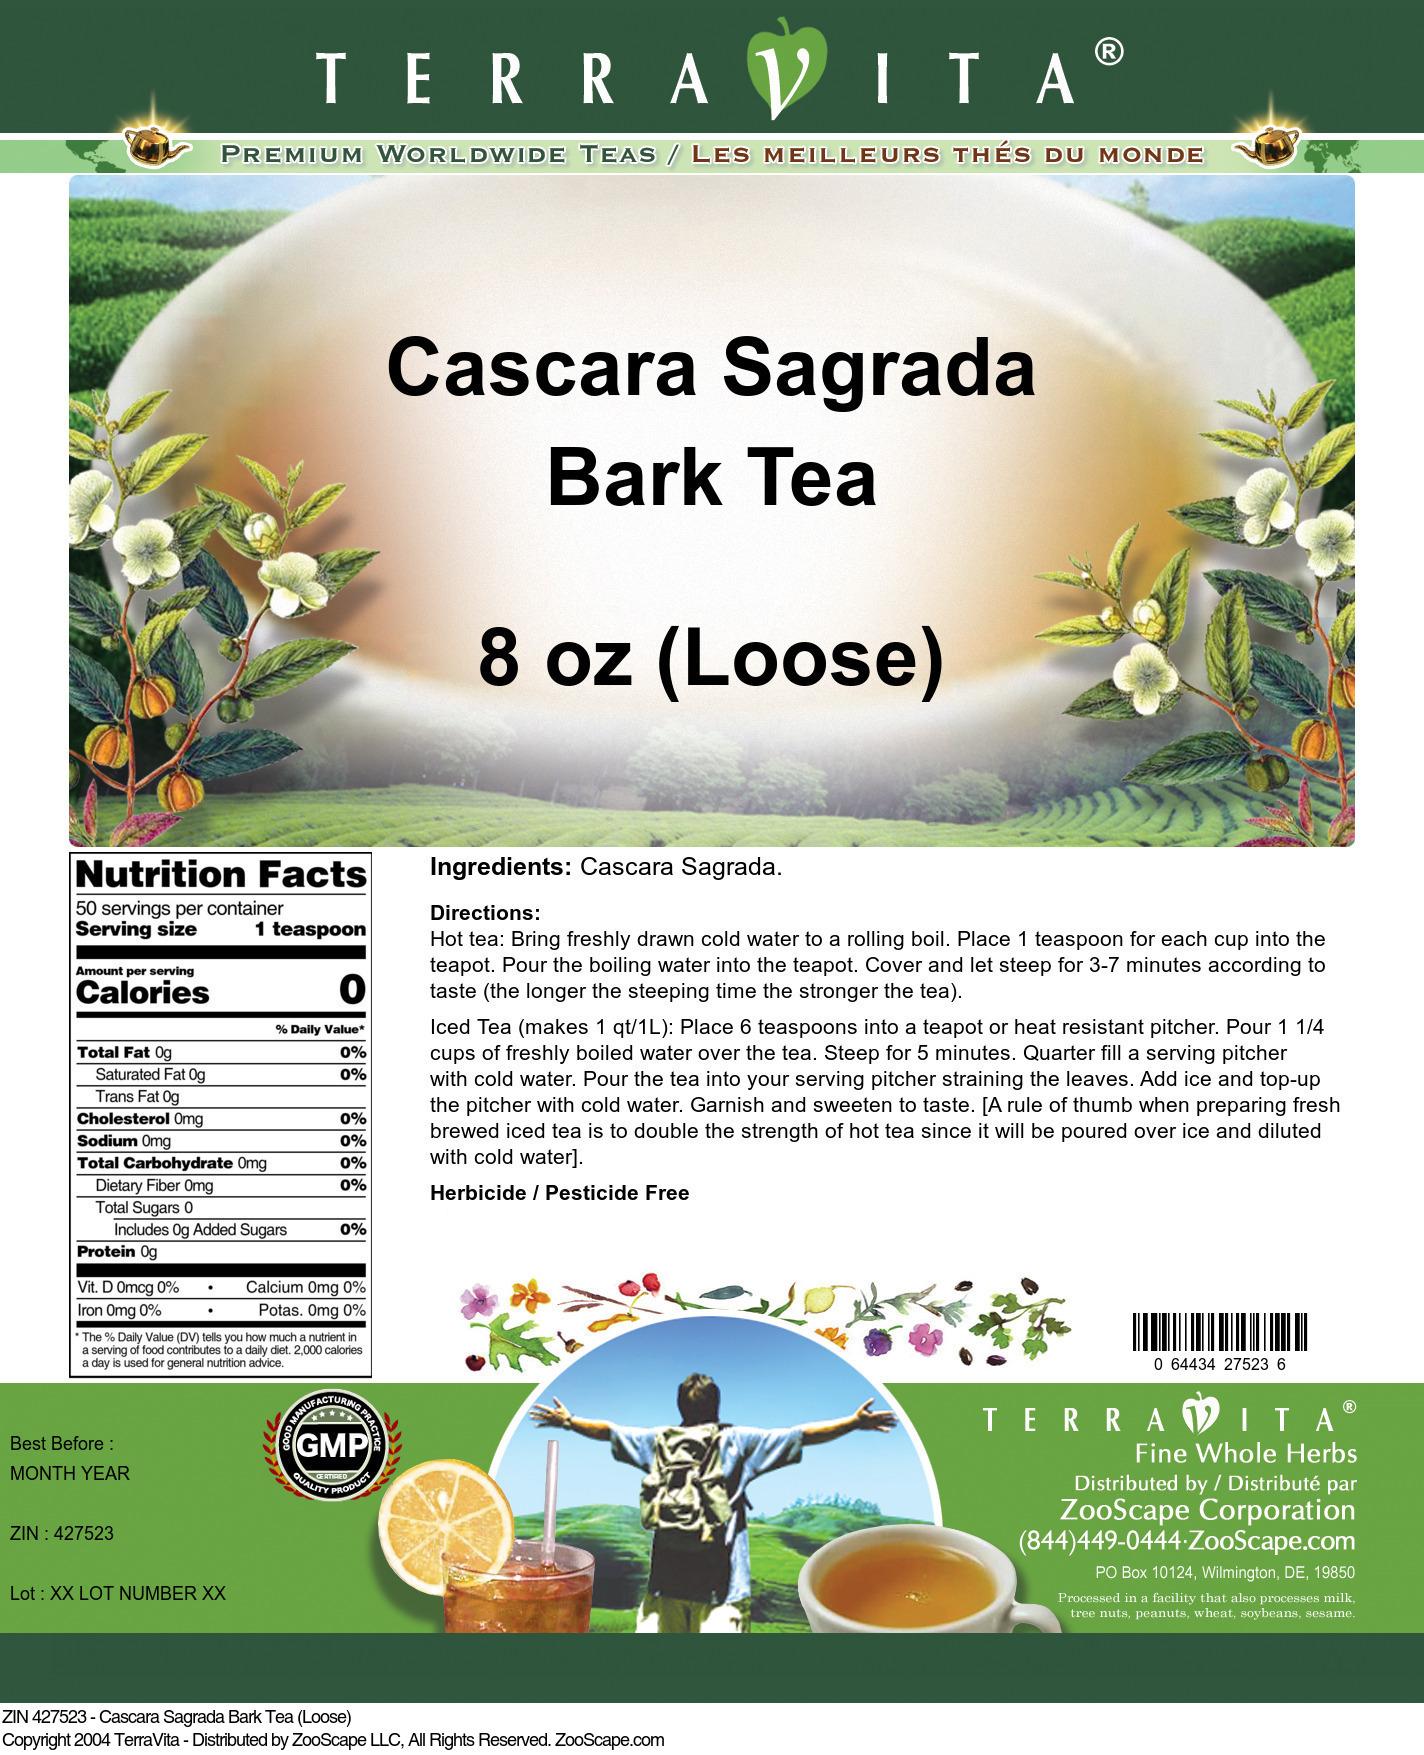 Cascara Sagrada Bark Tea (Loose)